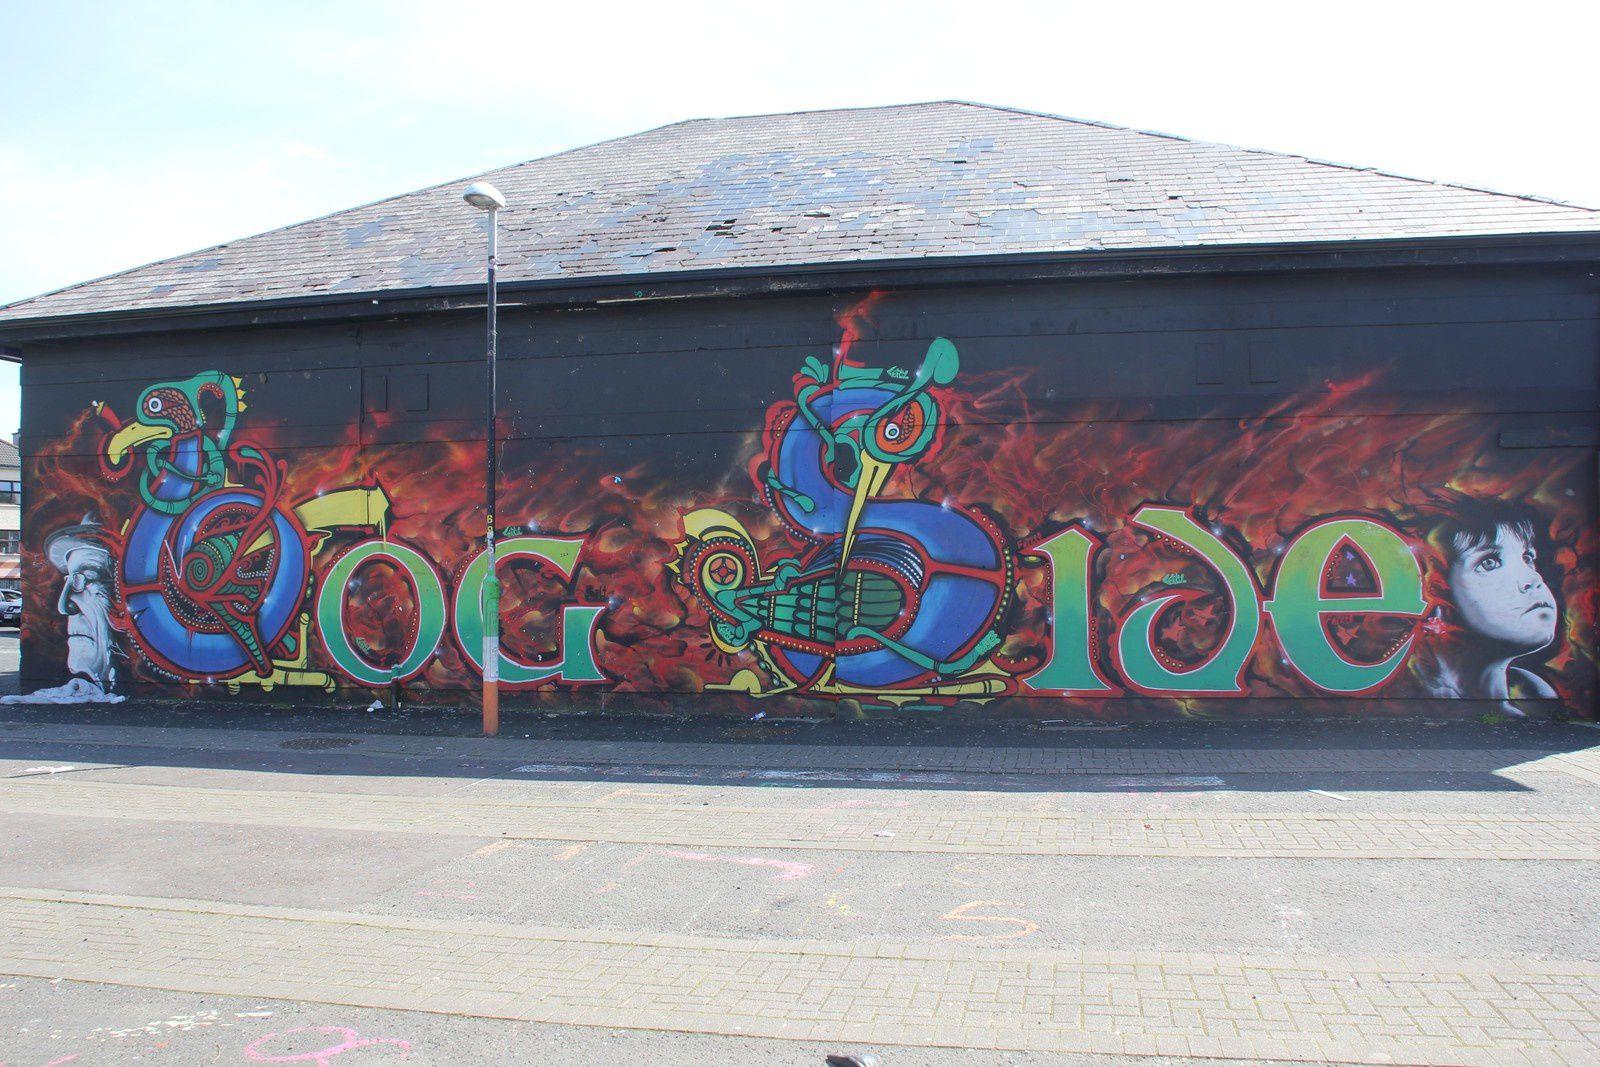 546) Meenan Square, Derry